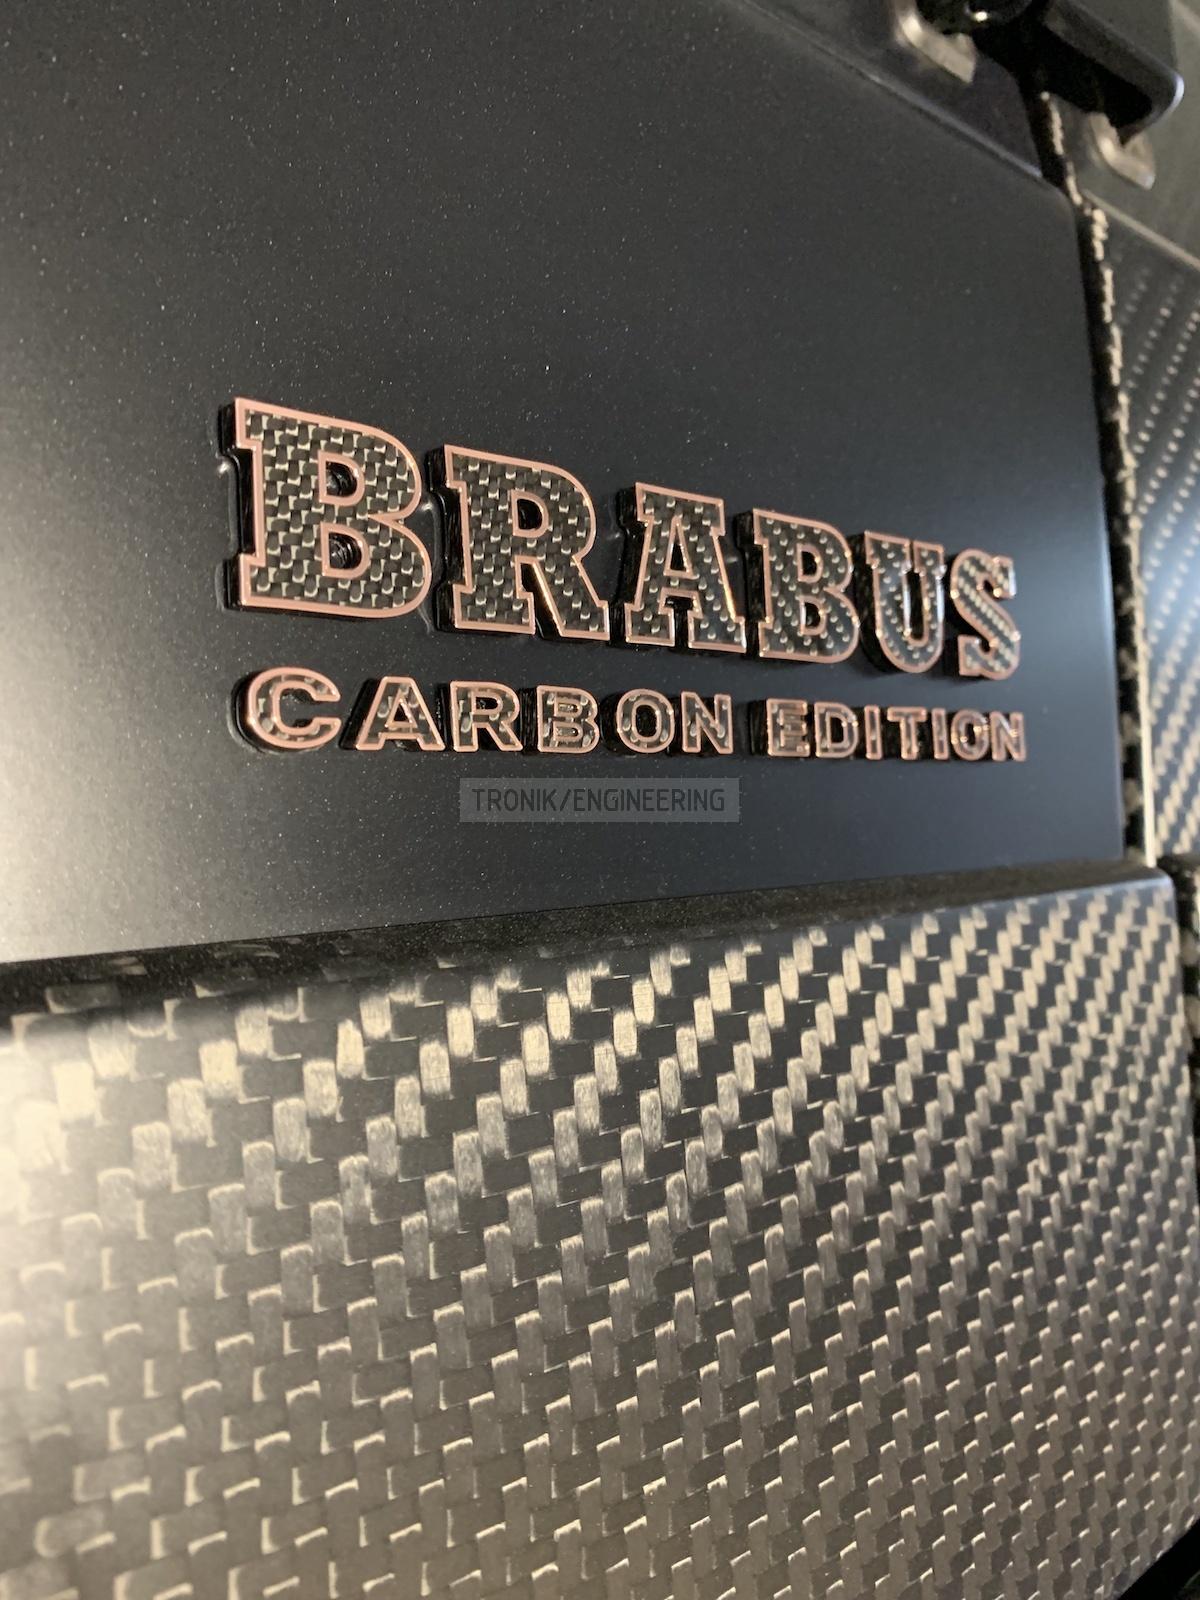 brabus carbon edition